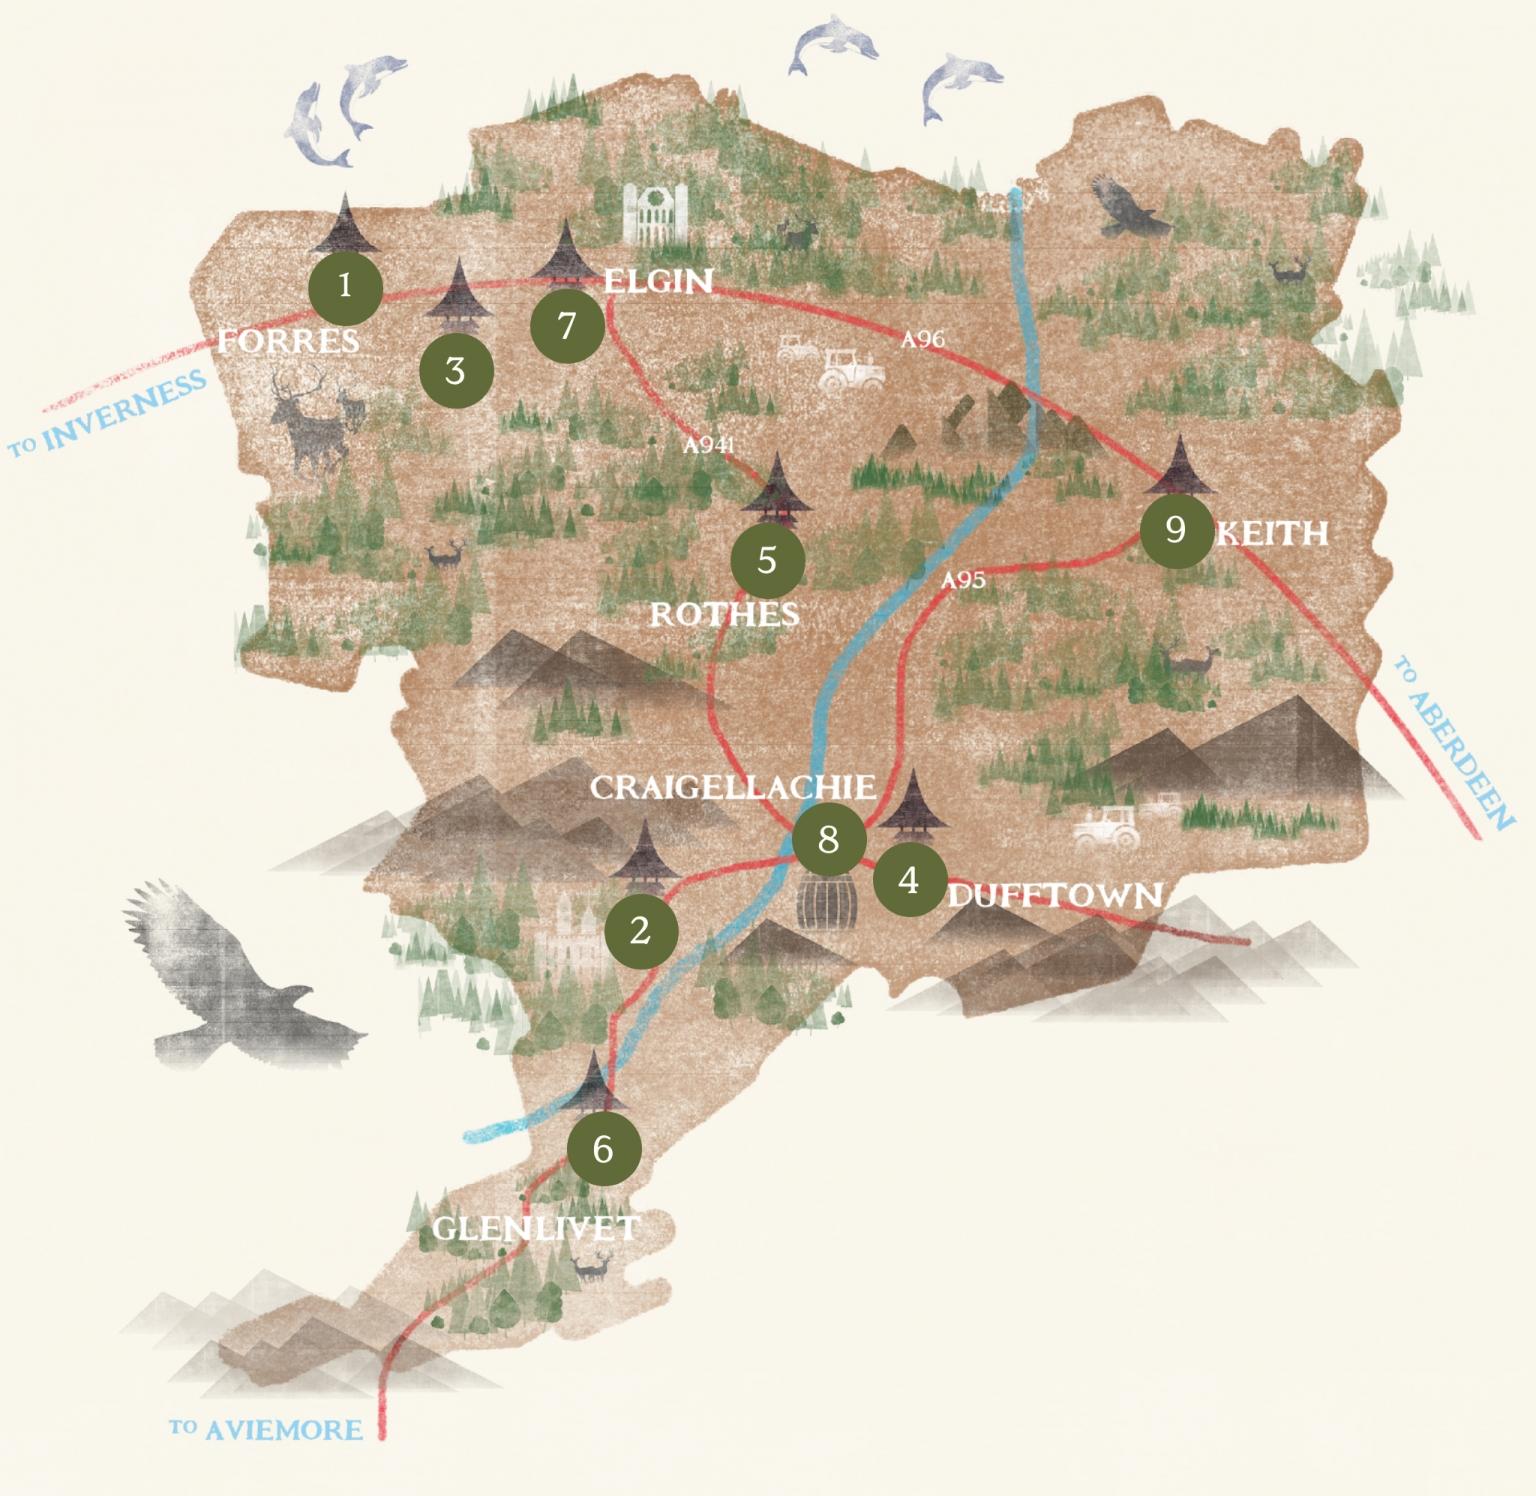 The Malt Whisky Trail map of distilleries.